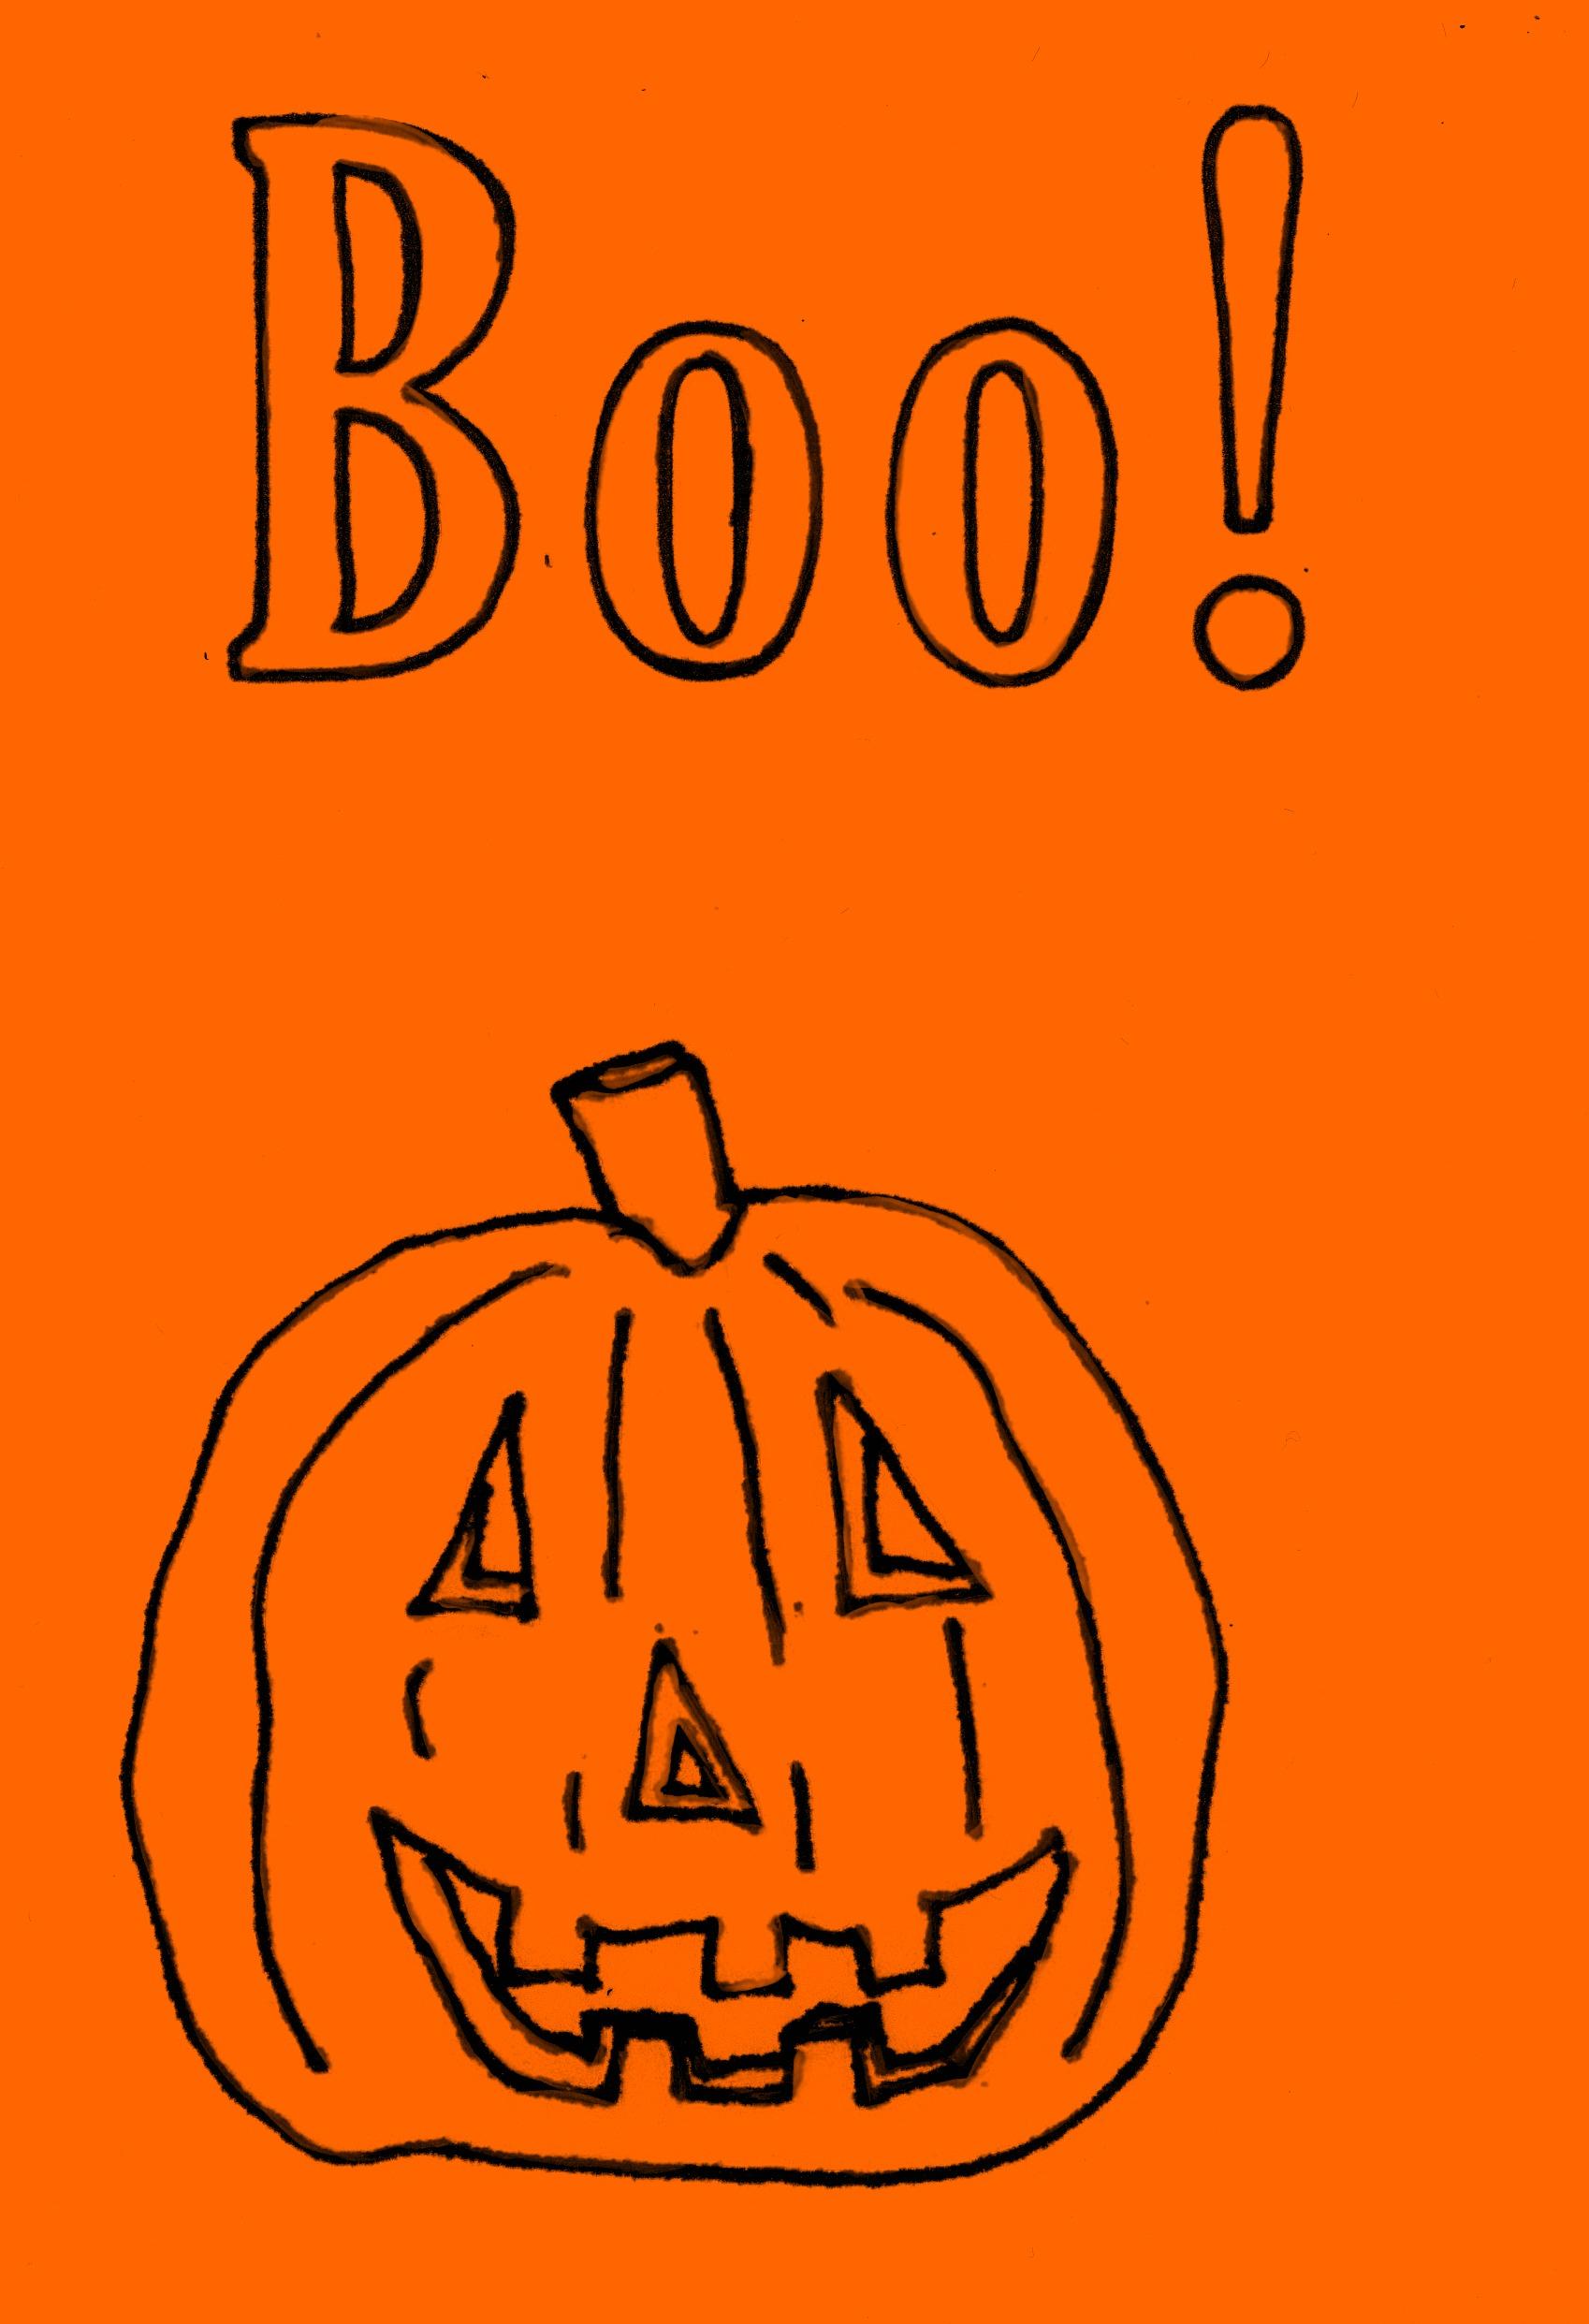 1698x2483 Boo! Jack O Lantern Line Drawing Handwritten Life